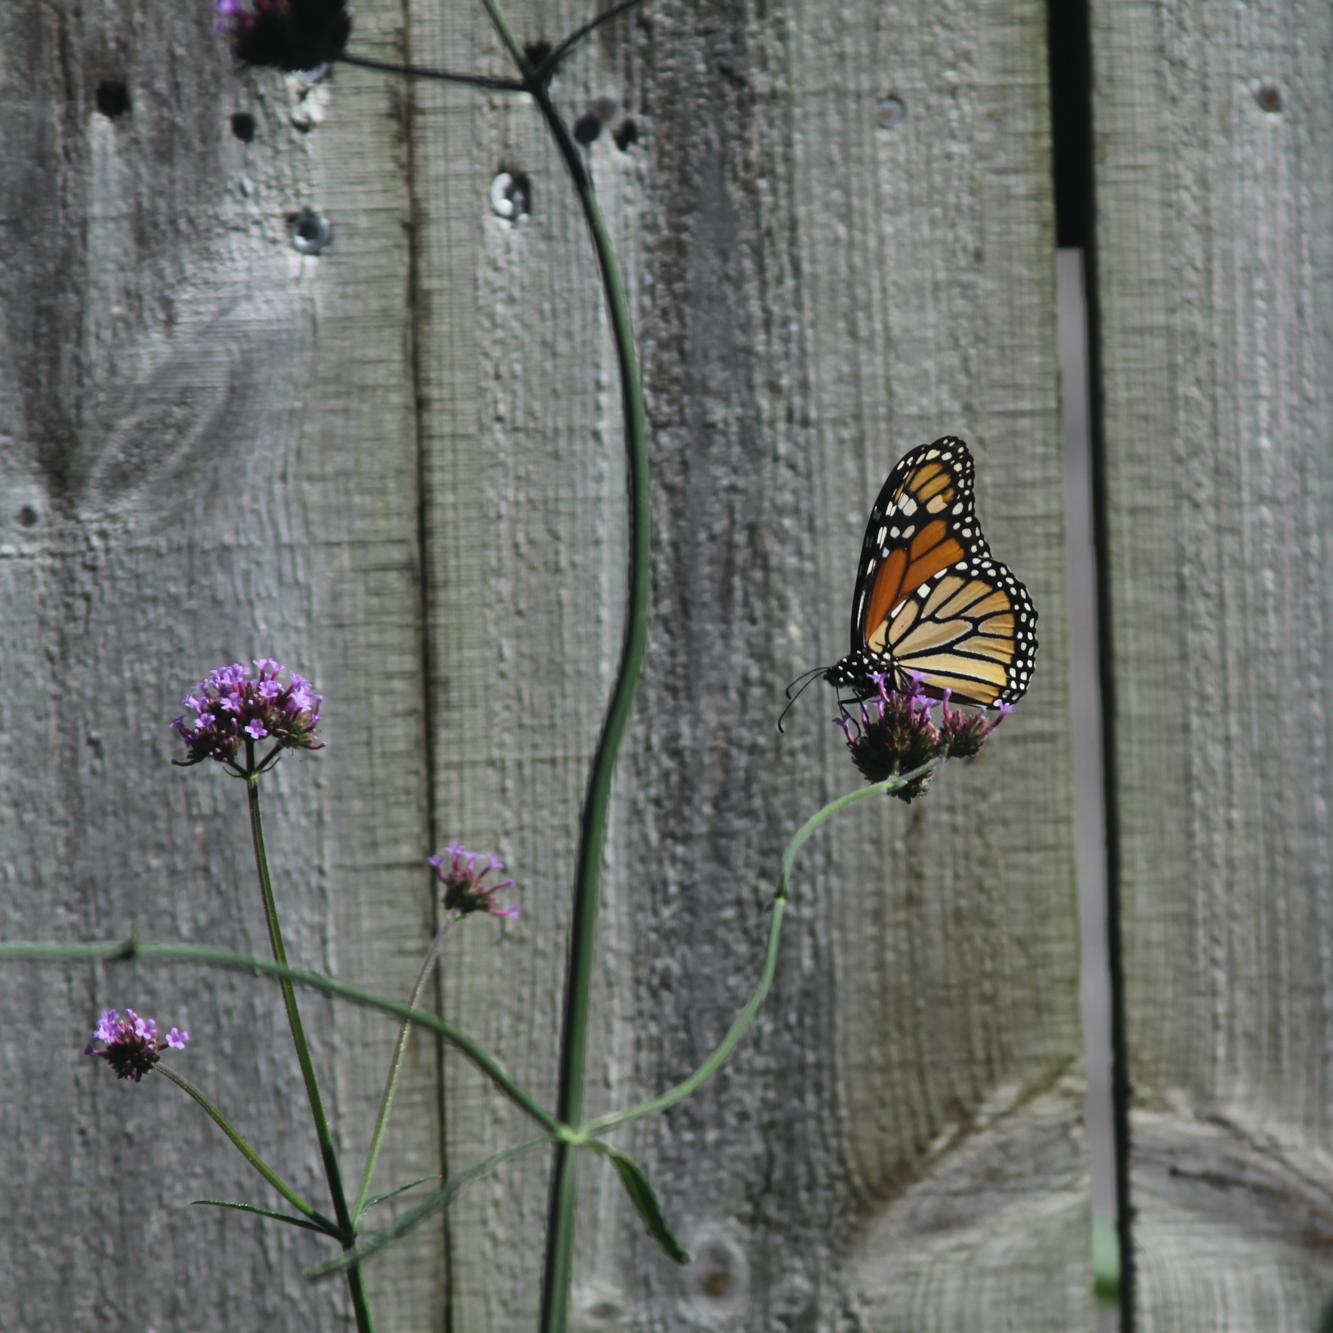 The monarchs love the self-seeded verbena in my garden